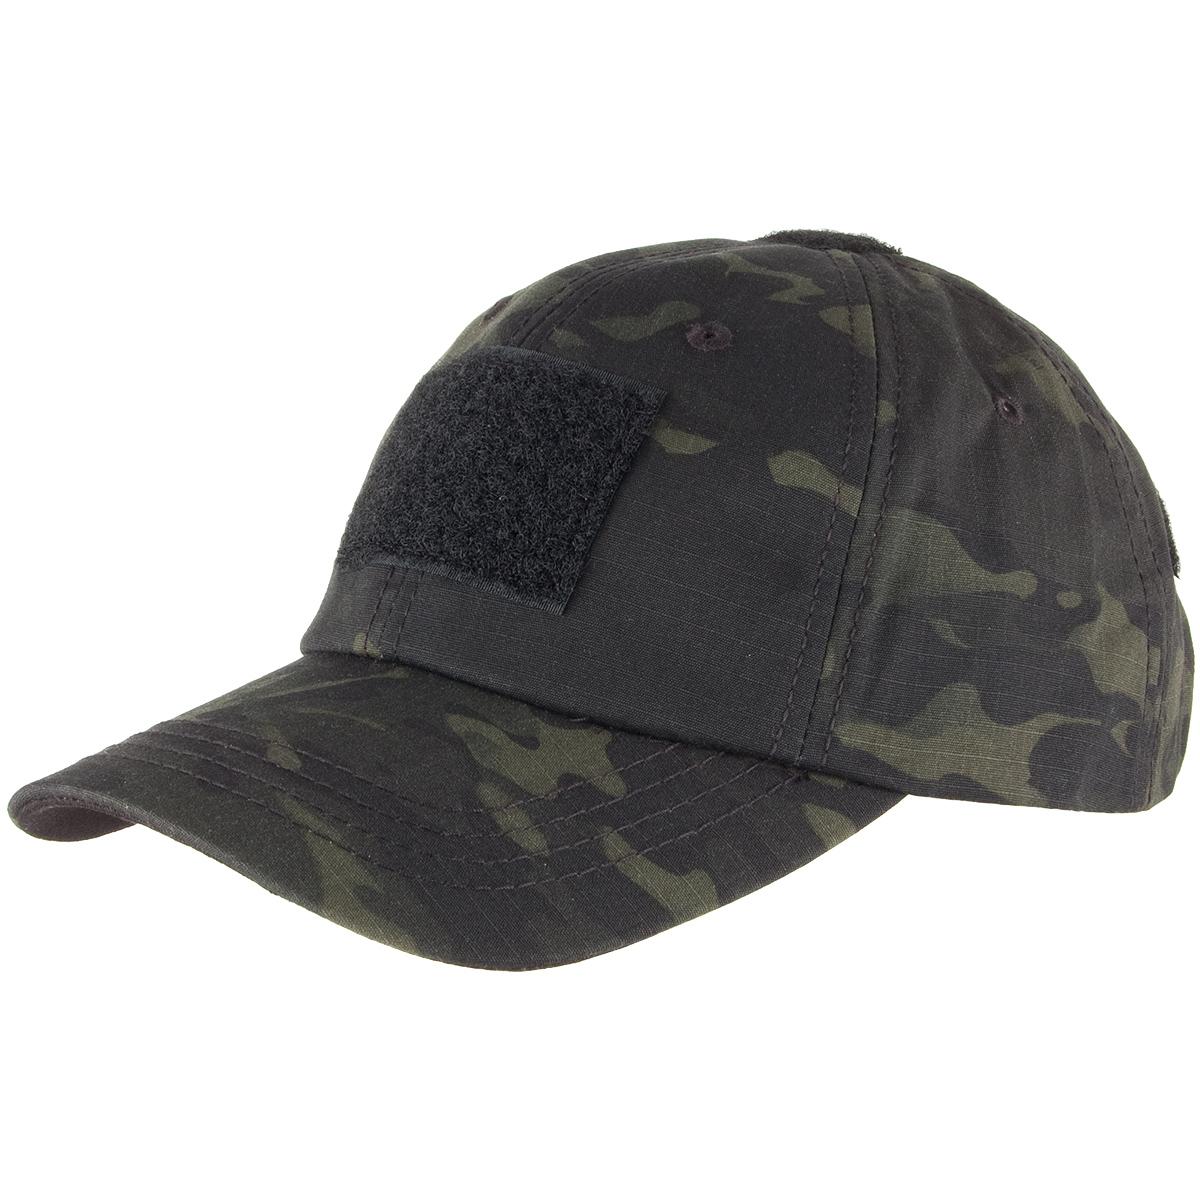 condor baseball cap army patrol hat ripstop